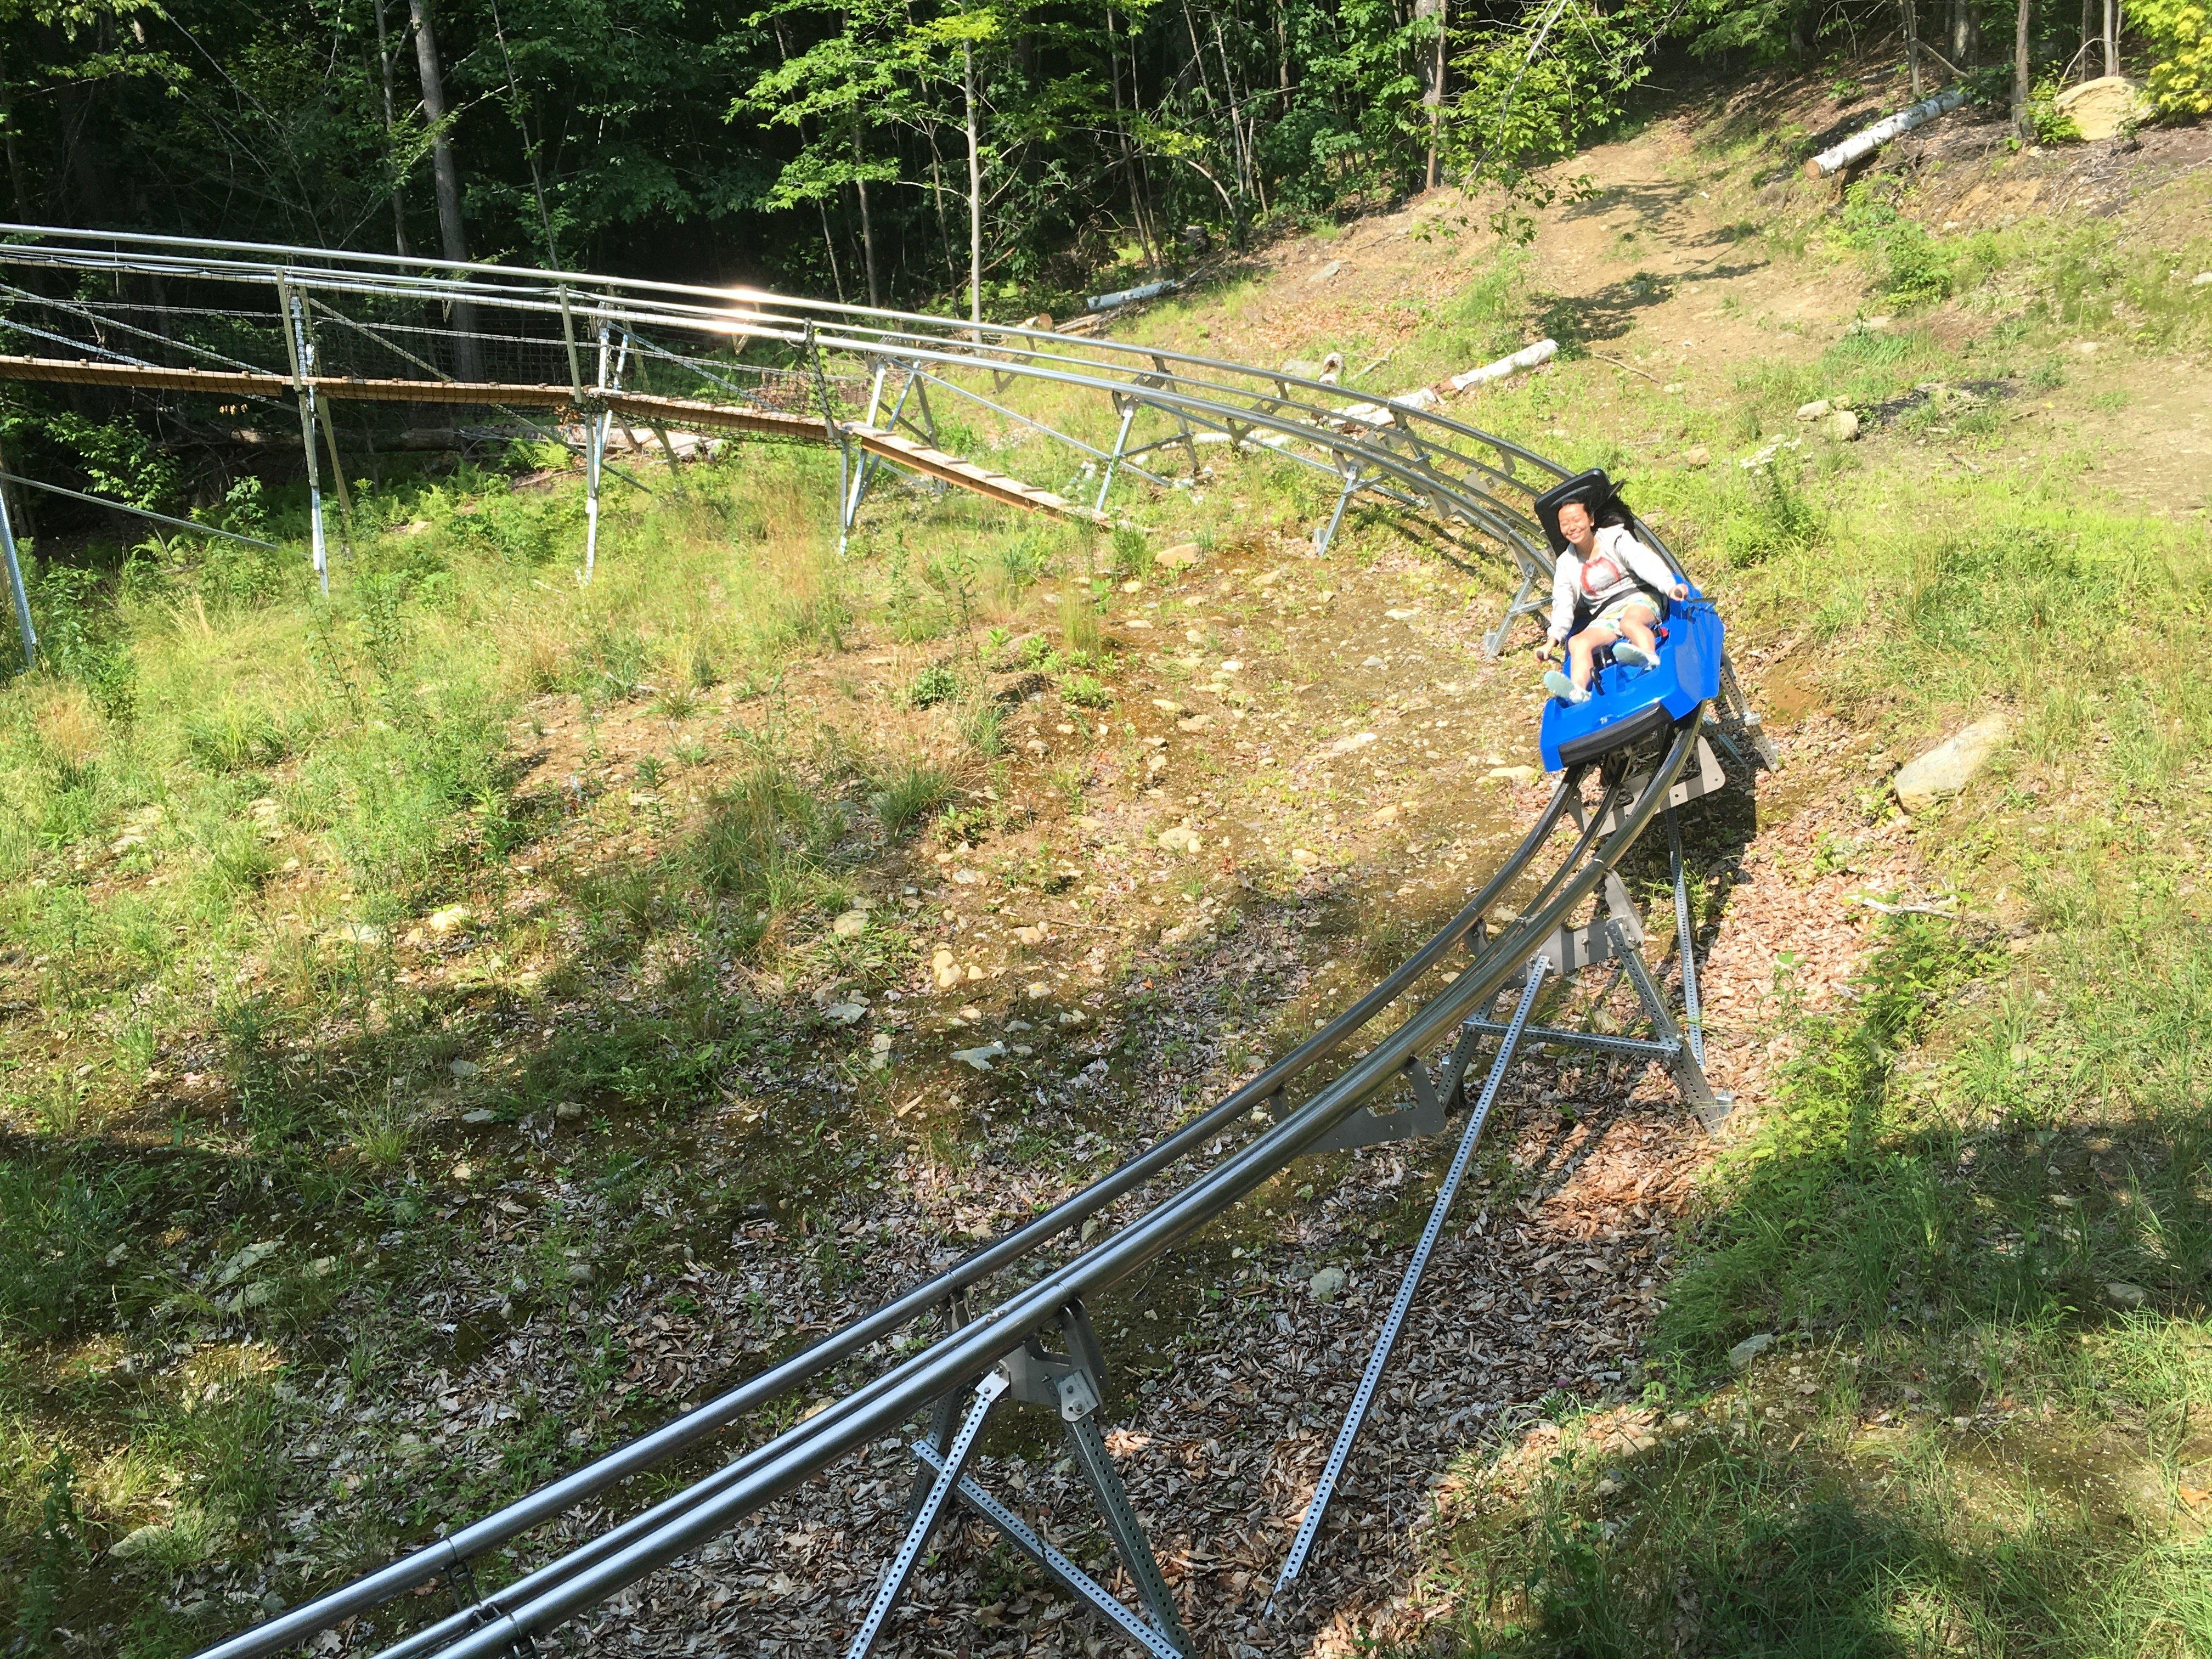 International student Natasha speeds down the mountain coaster at Berkshire East.